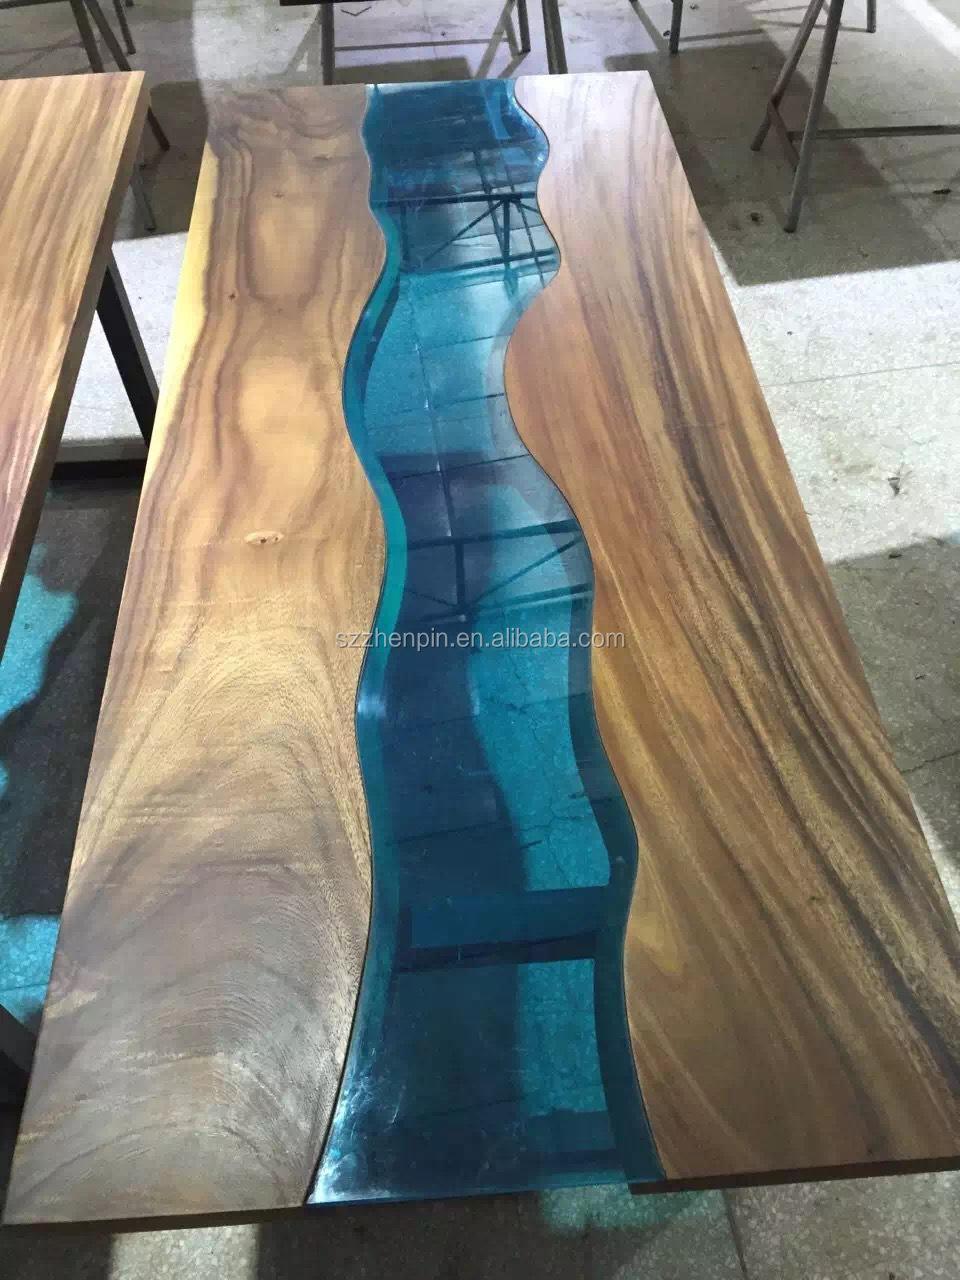 Buy Solid Wood Bedroom Furniture